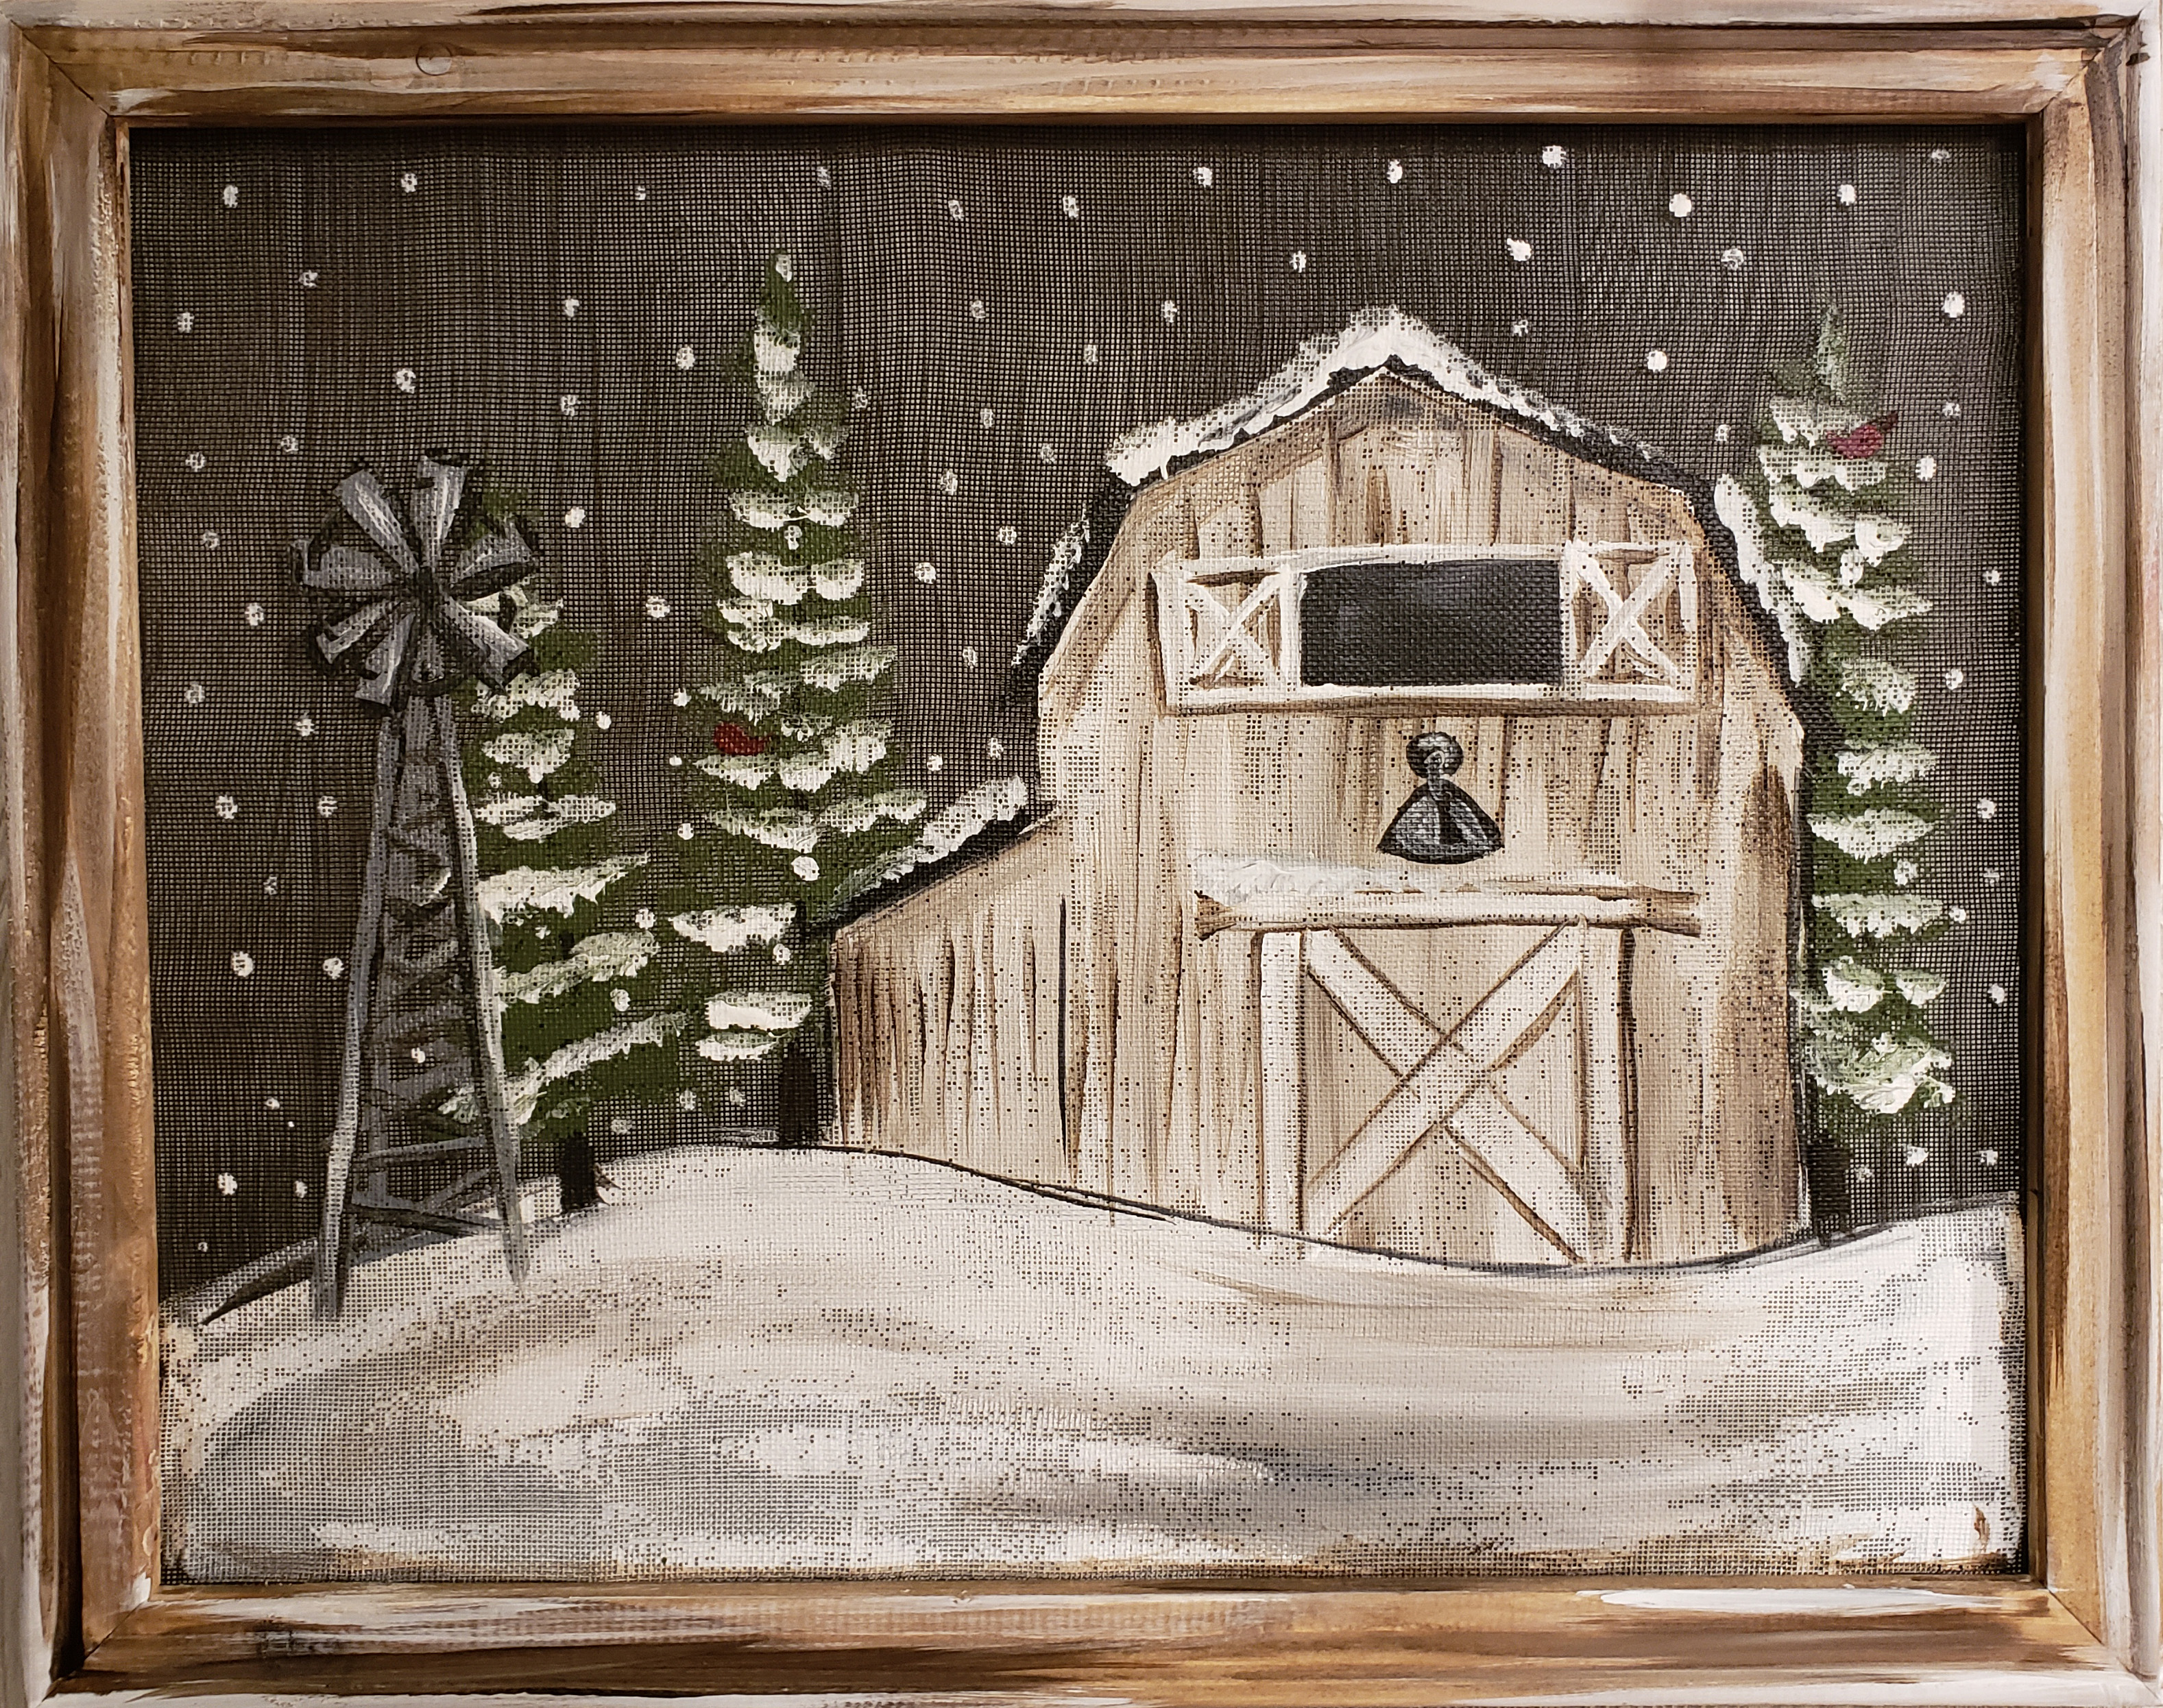 Barn Scene on a Screen